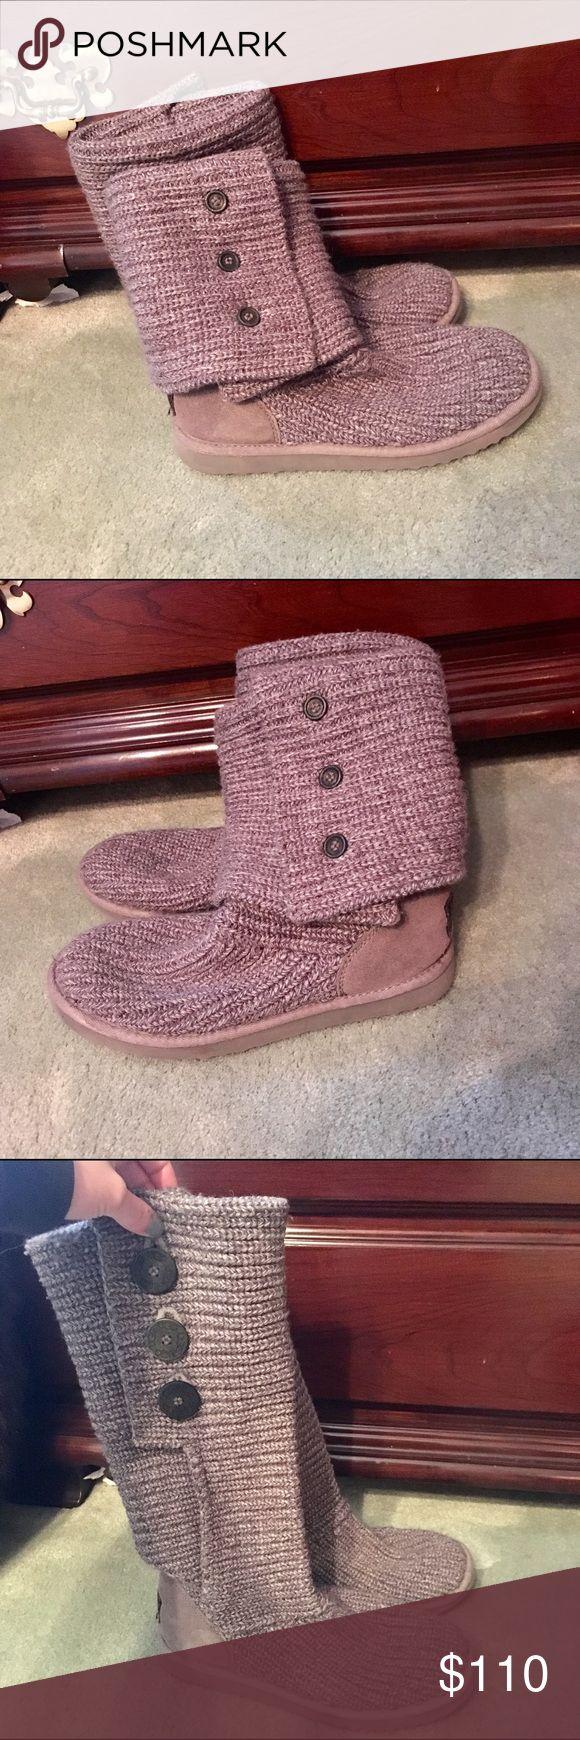 f40fa8c38ec closeout ugg cardy crochet boots 764e0 f7002